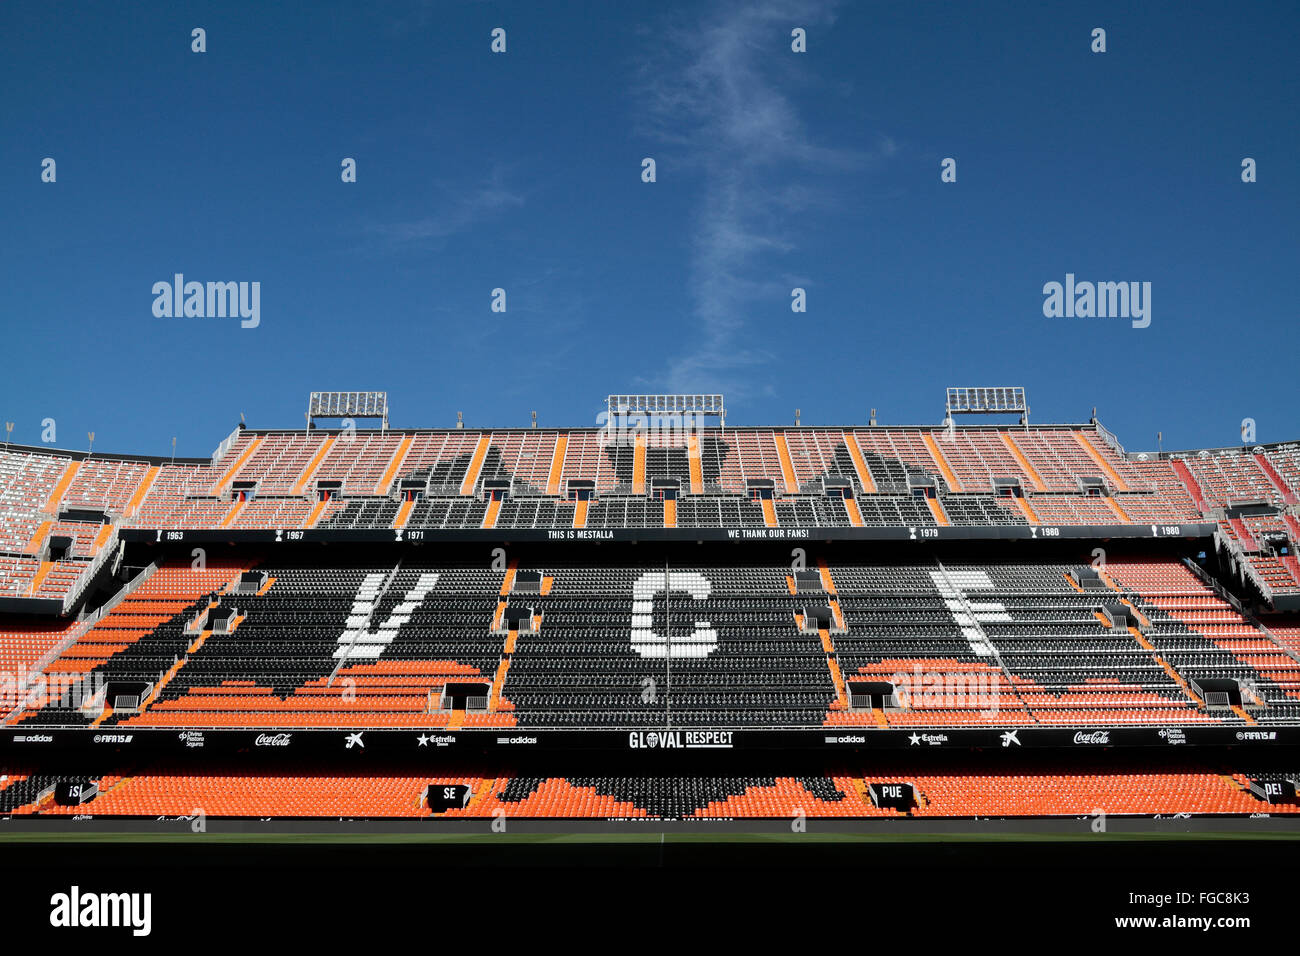 Stands in the Mestalla stadium, home of Spanish La Liga side Valencia CF, Valencia, Spain. - Stock Image